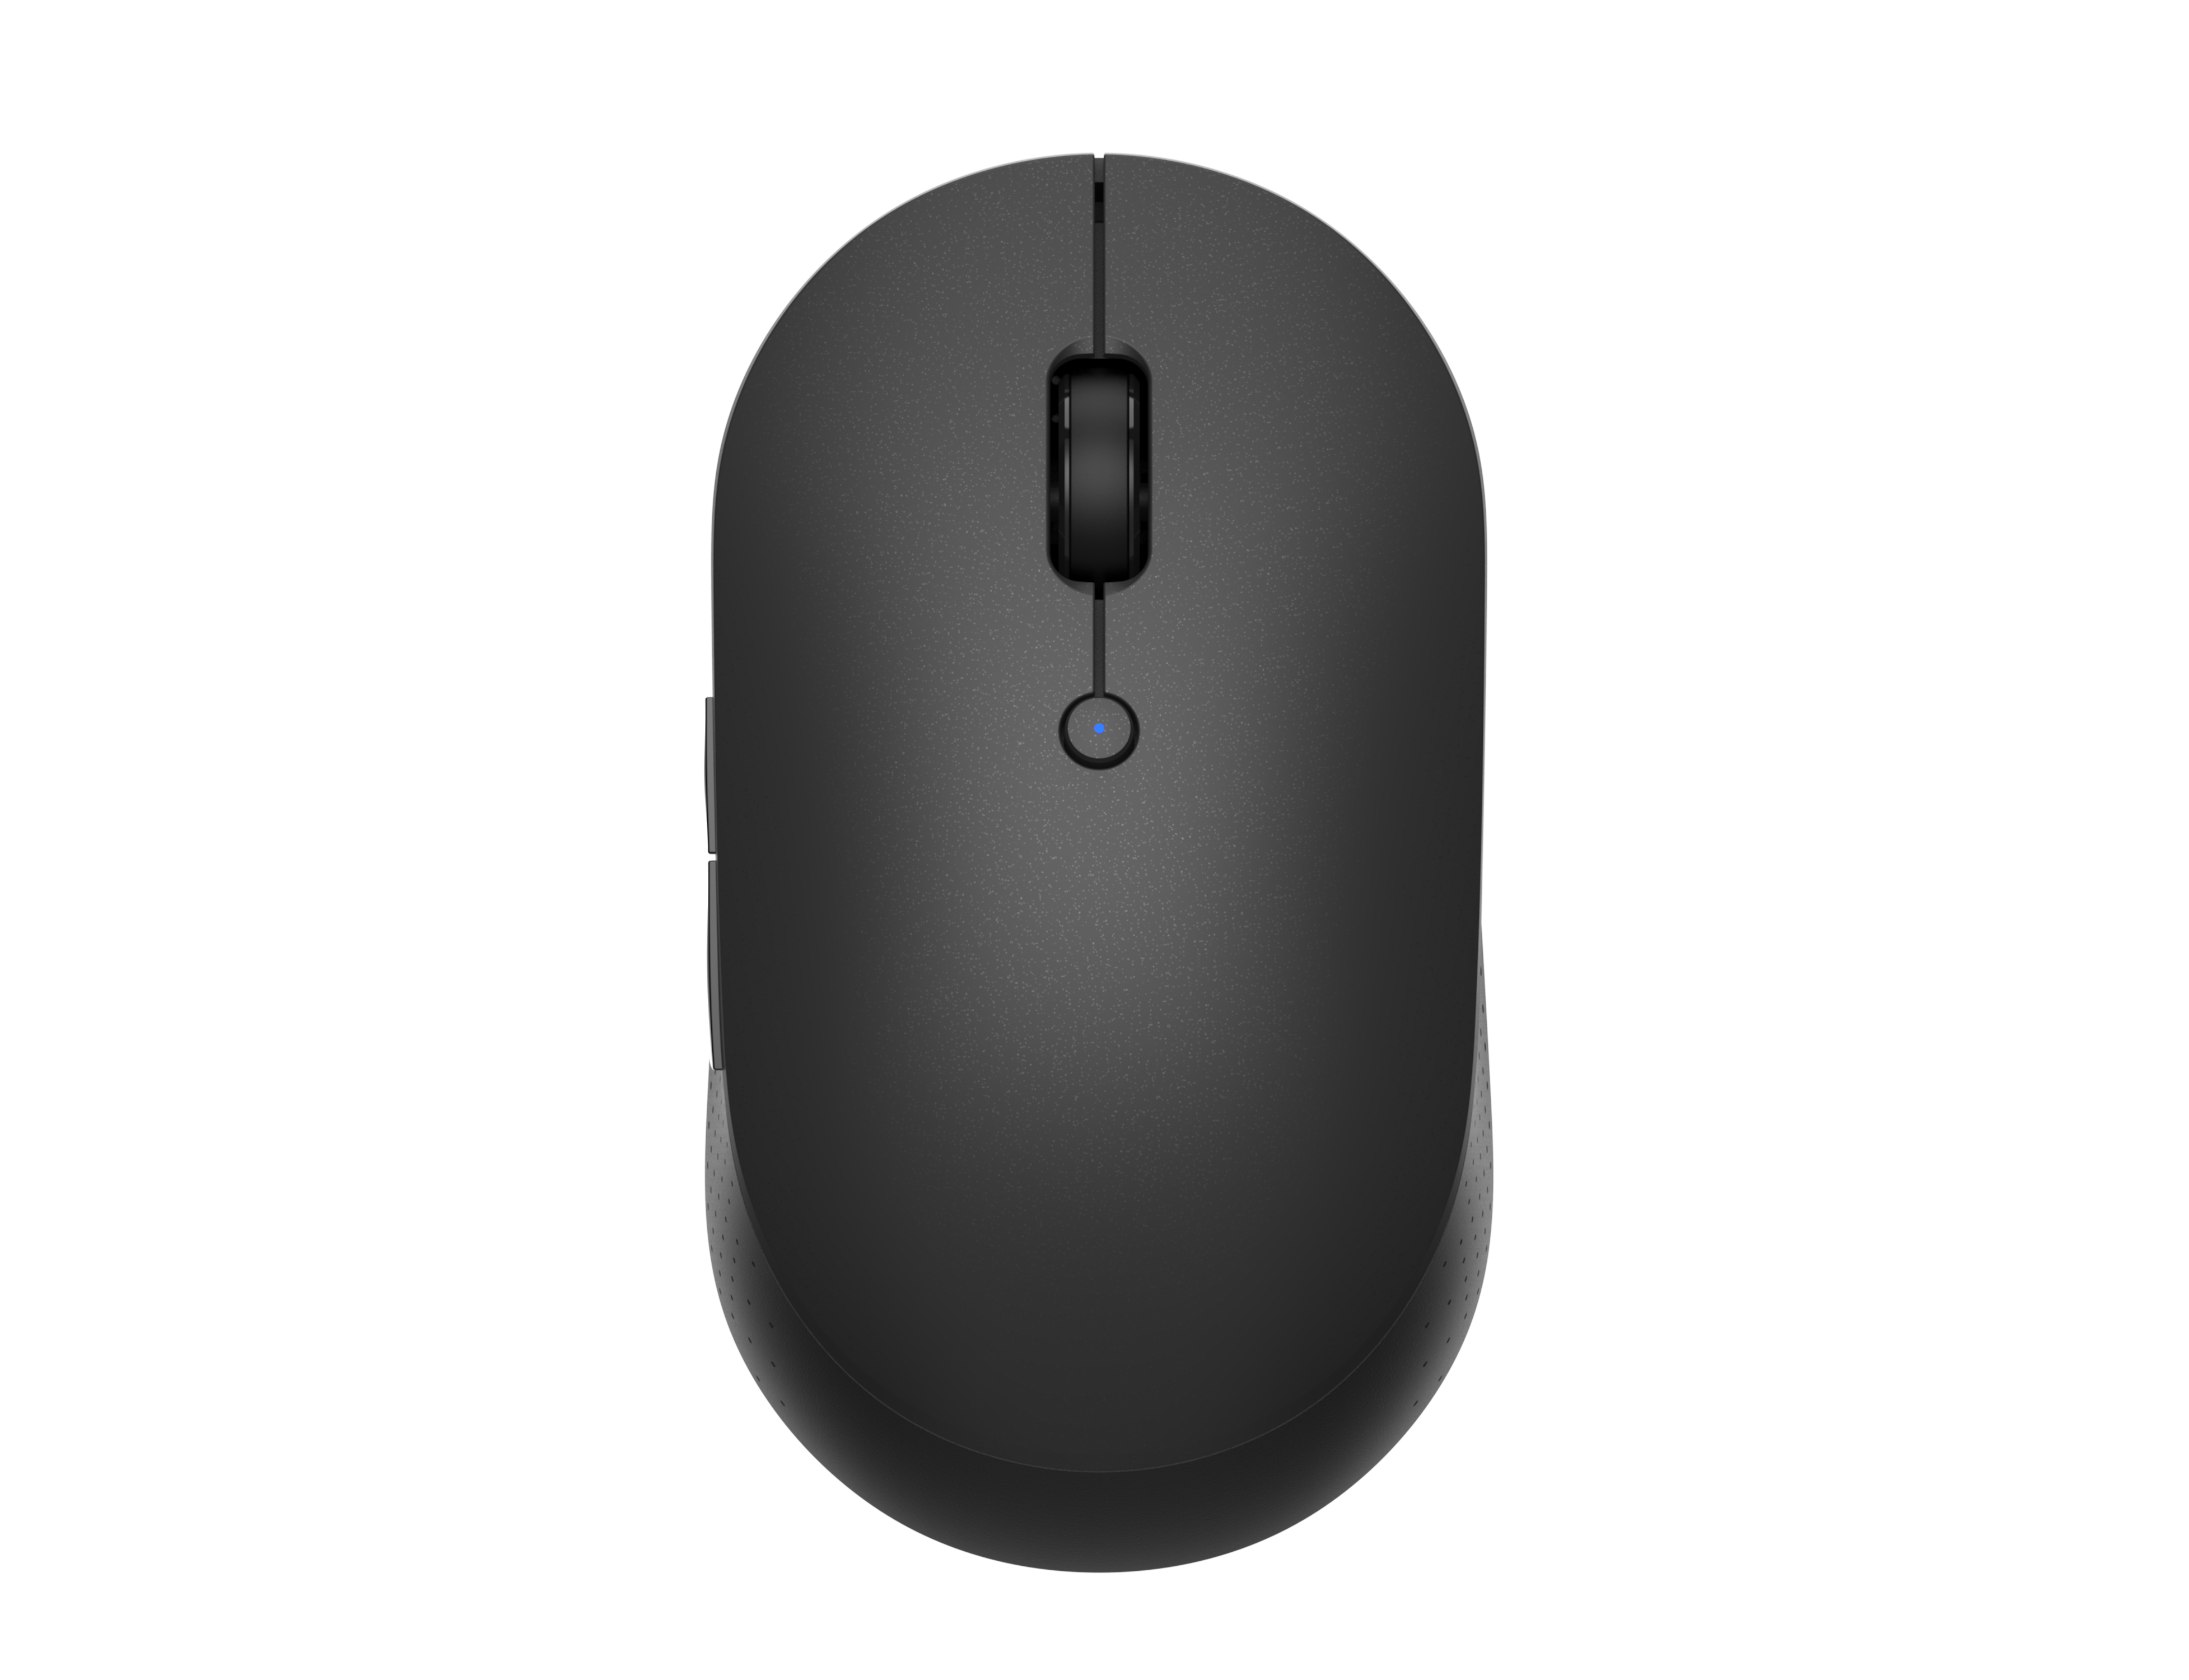 Xiaomi Mi Wireless Mouse Silent Edition Dual Mode เม้าส์ไร้สาย สีดำ (Global Version) - Black